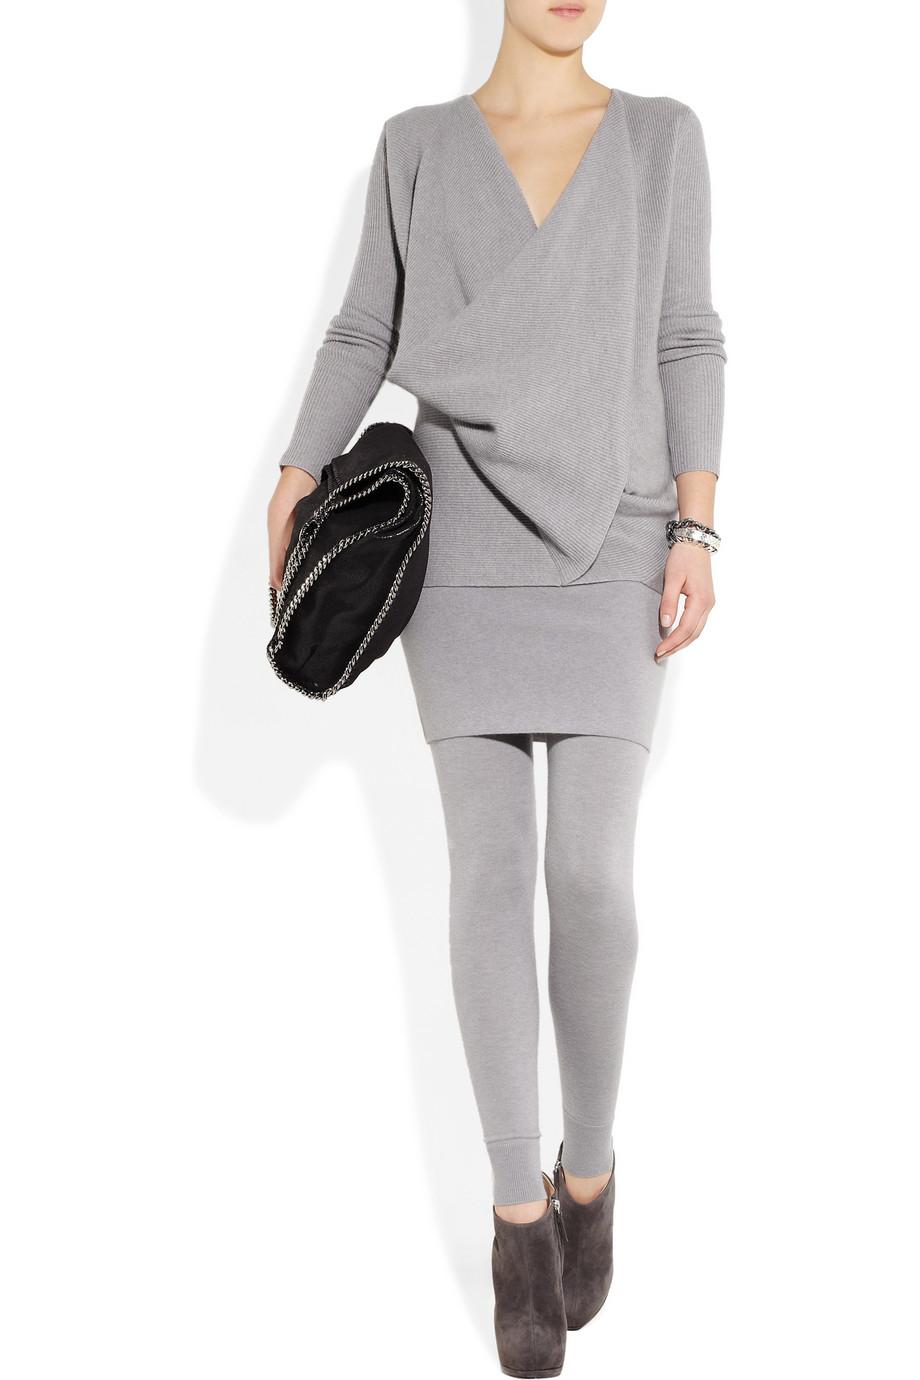 donna karan draped crossfront cashmere sweater in gray lyst. Black Bedroom Furniture Sets. Home Design Ideas